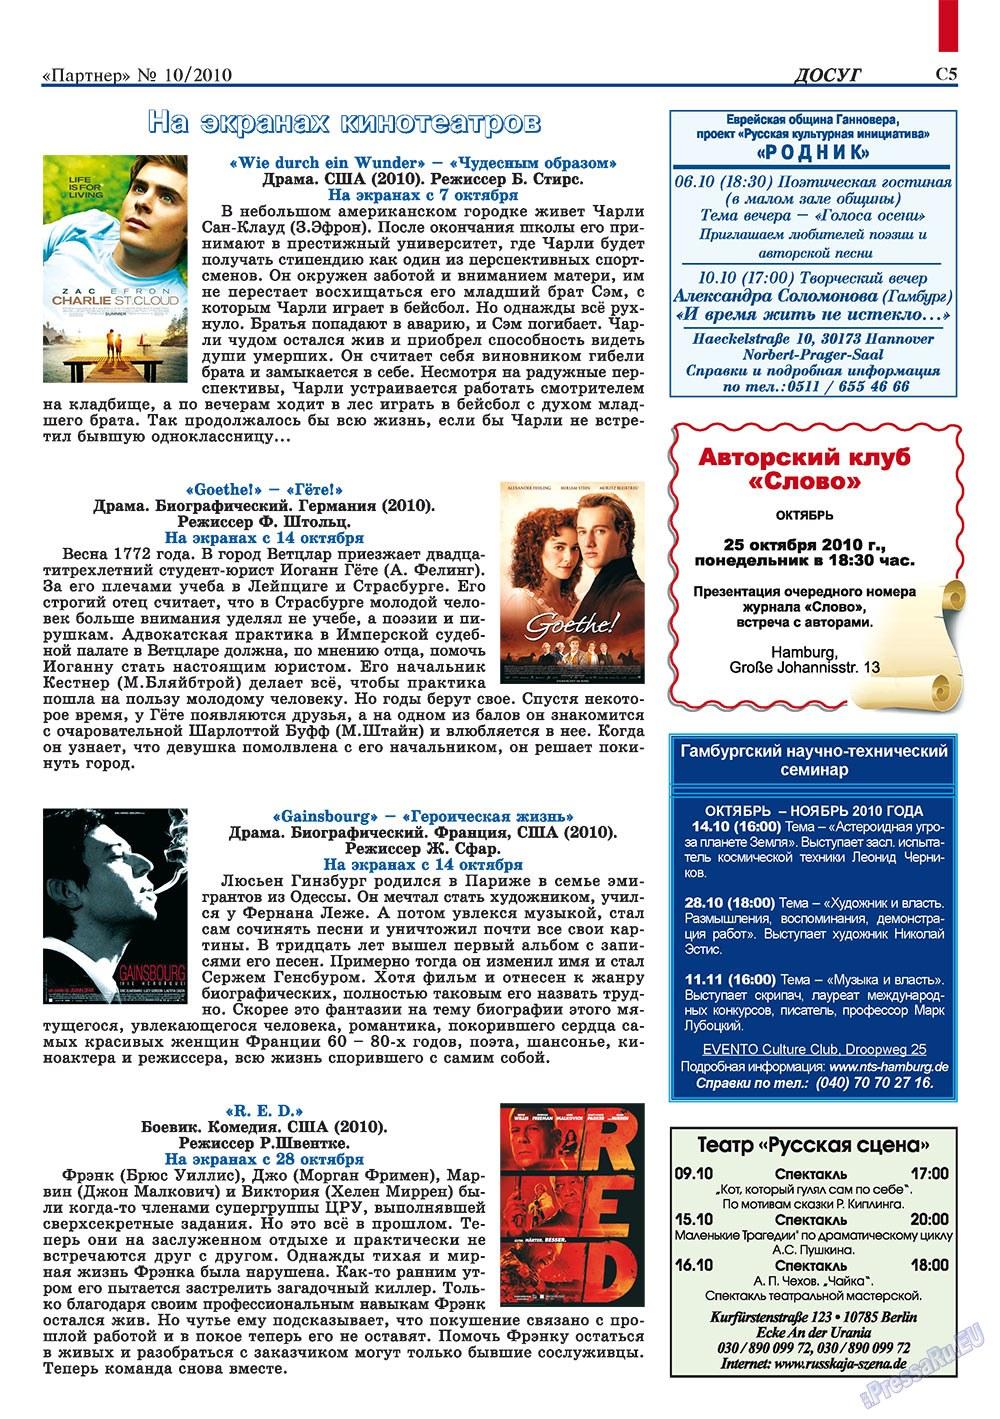 Партнер-север (журнал). 2010 год, номер 10, стр. 63